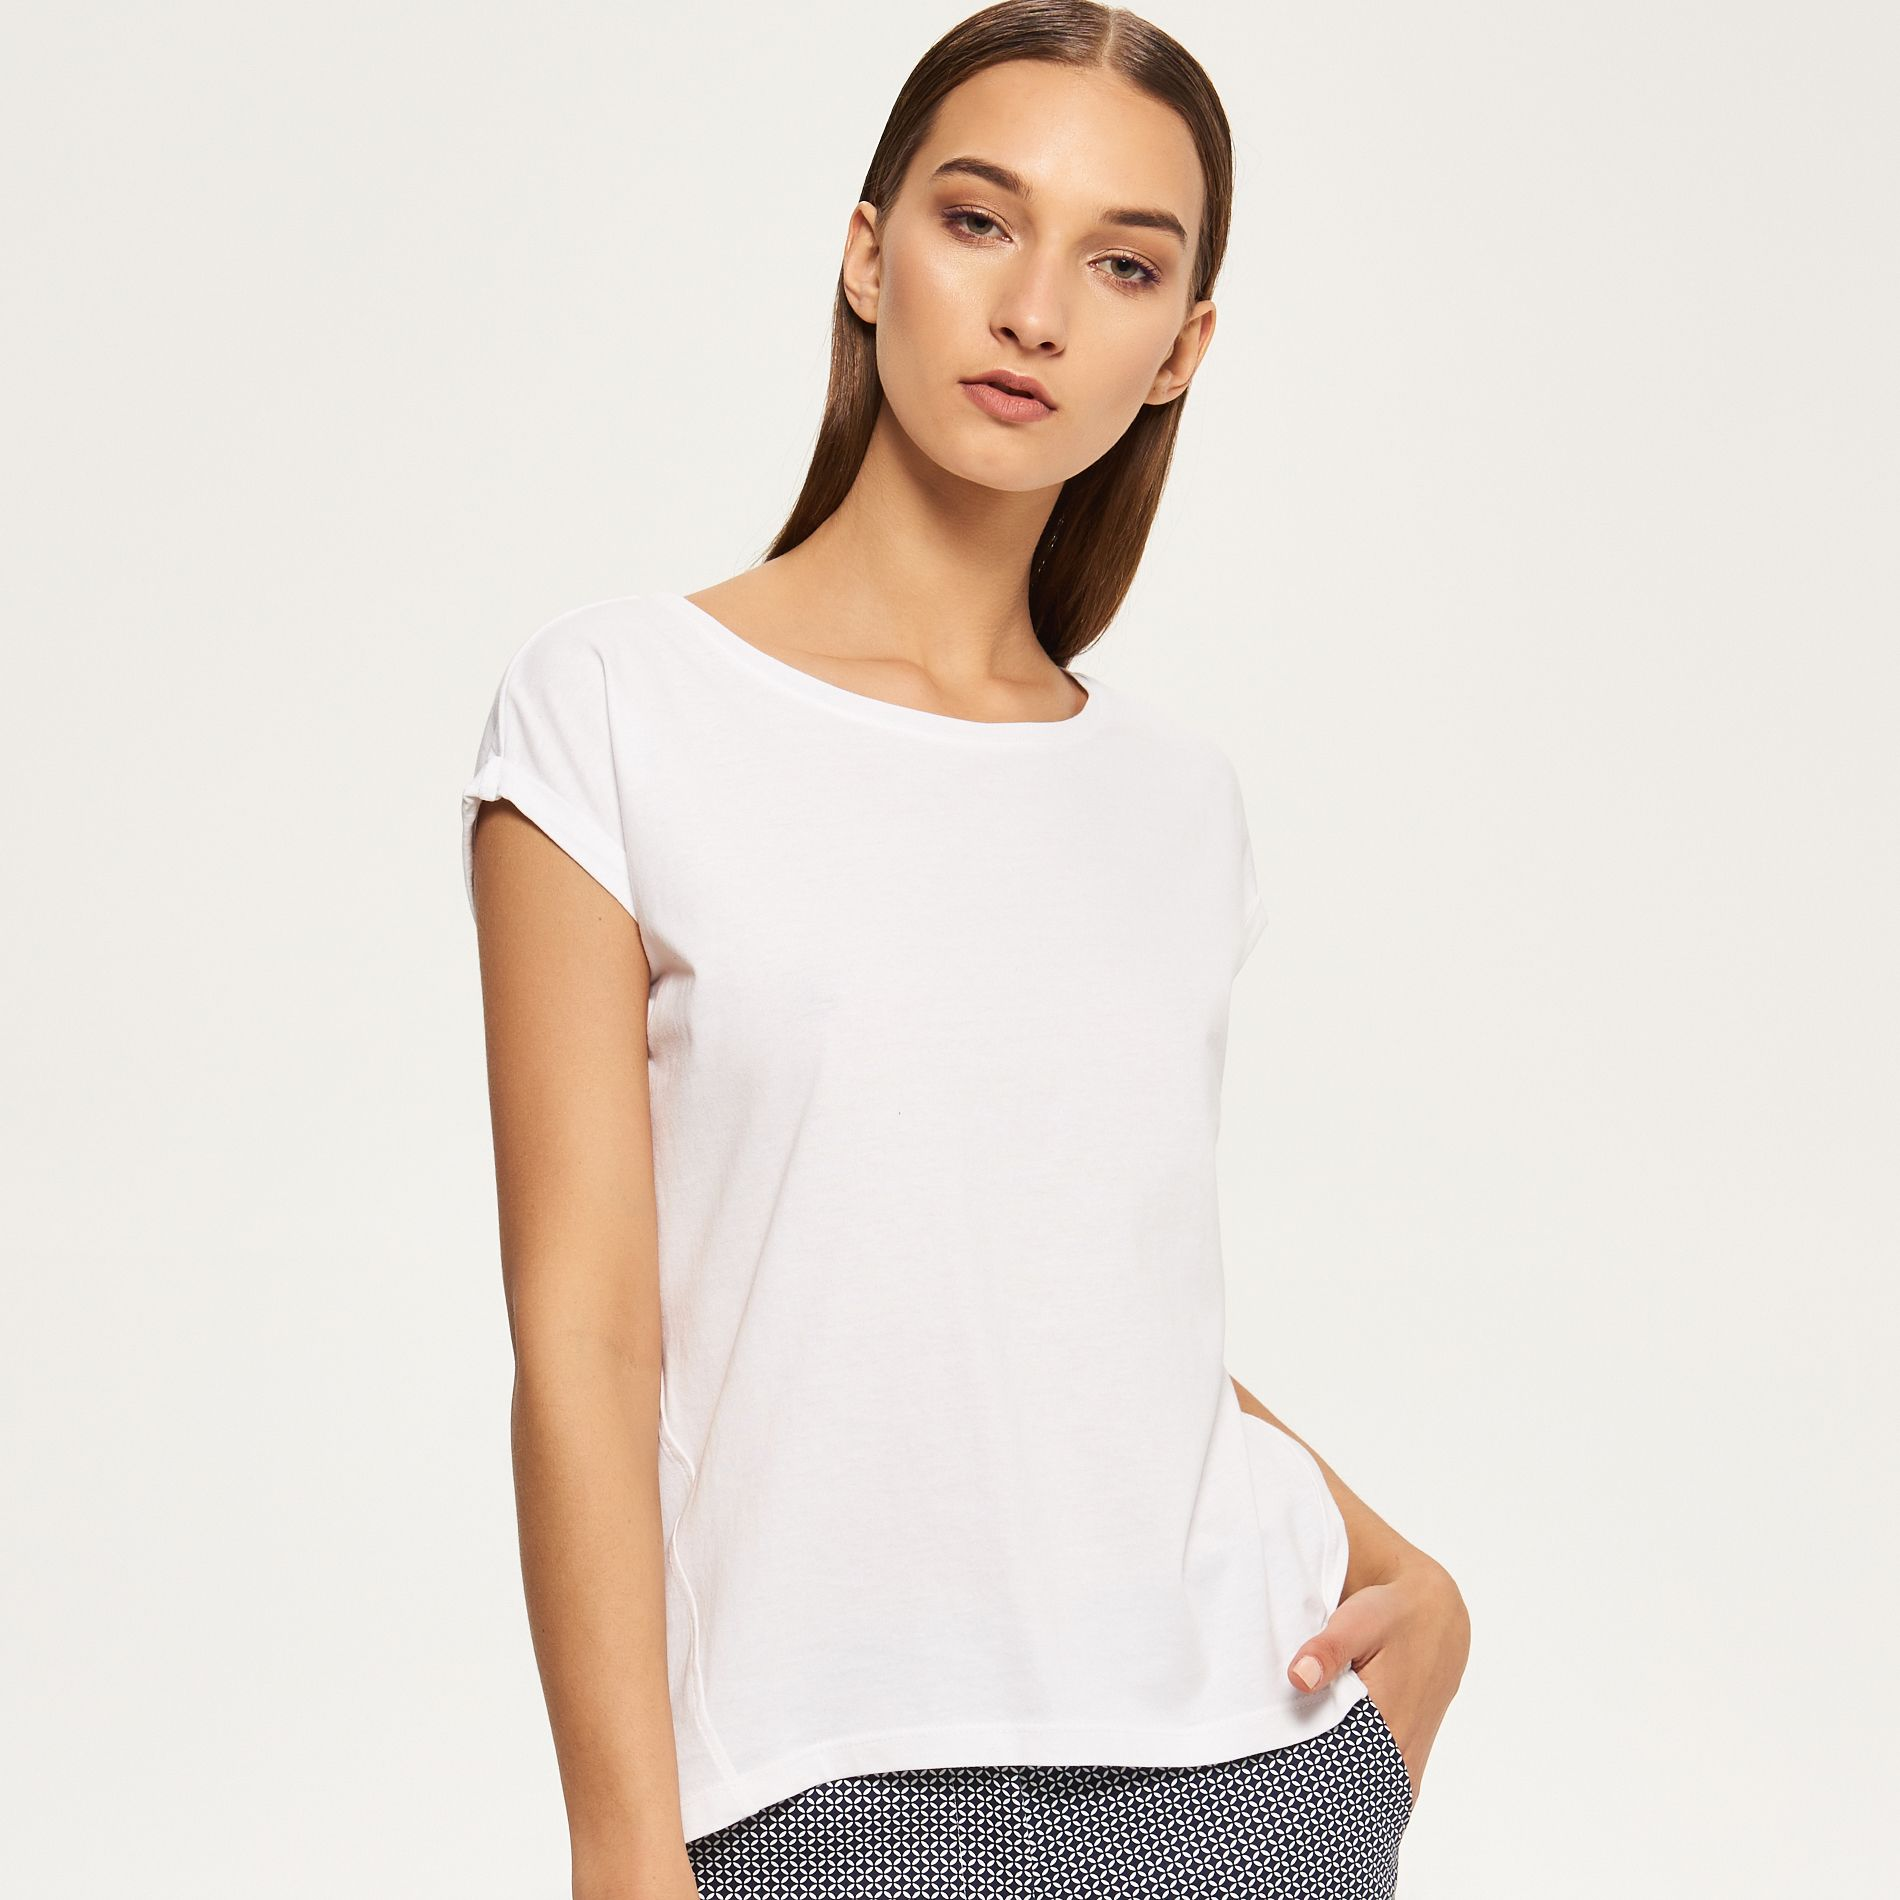 Hladké tričko, RESERVED, QG260-00X